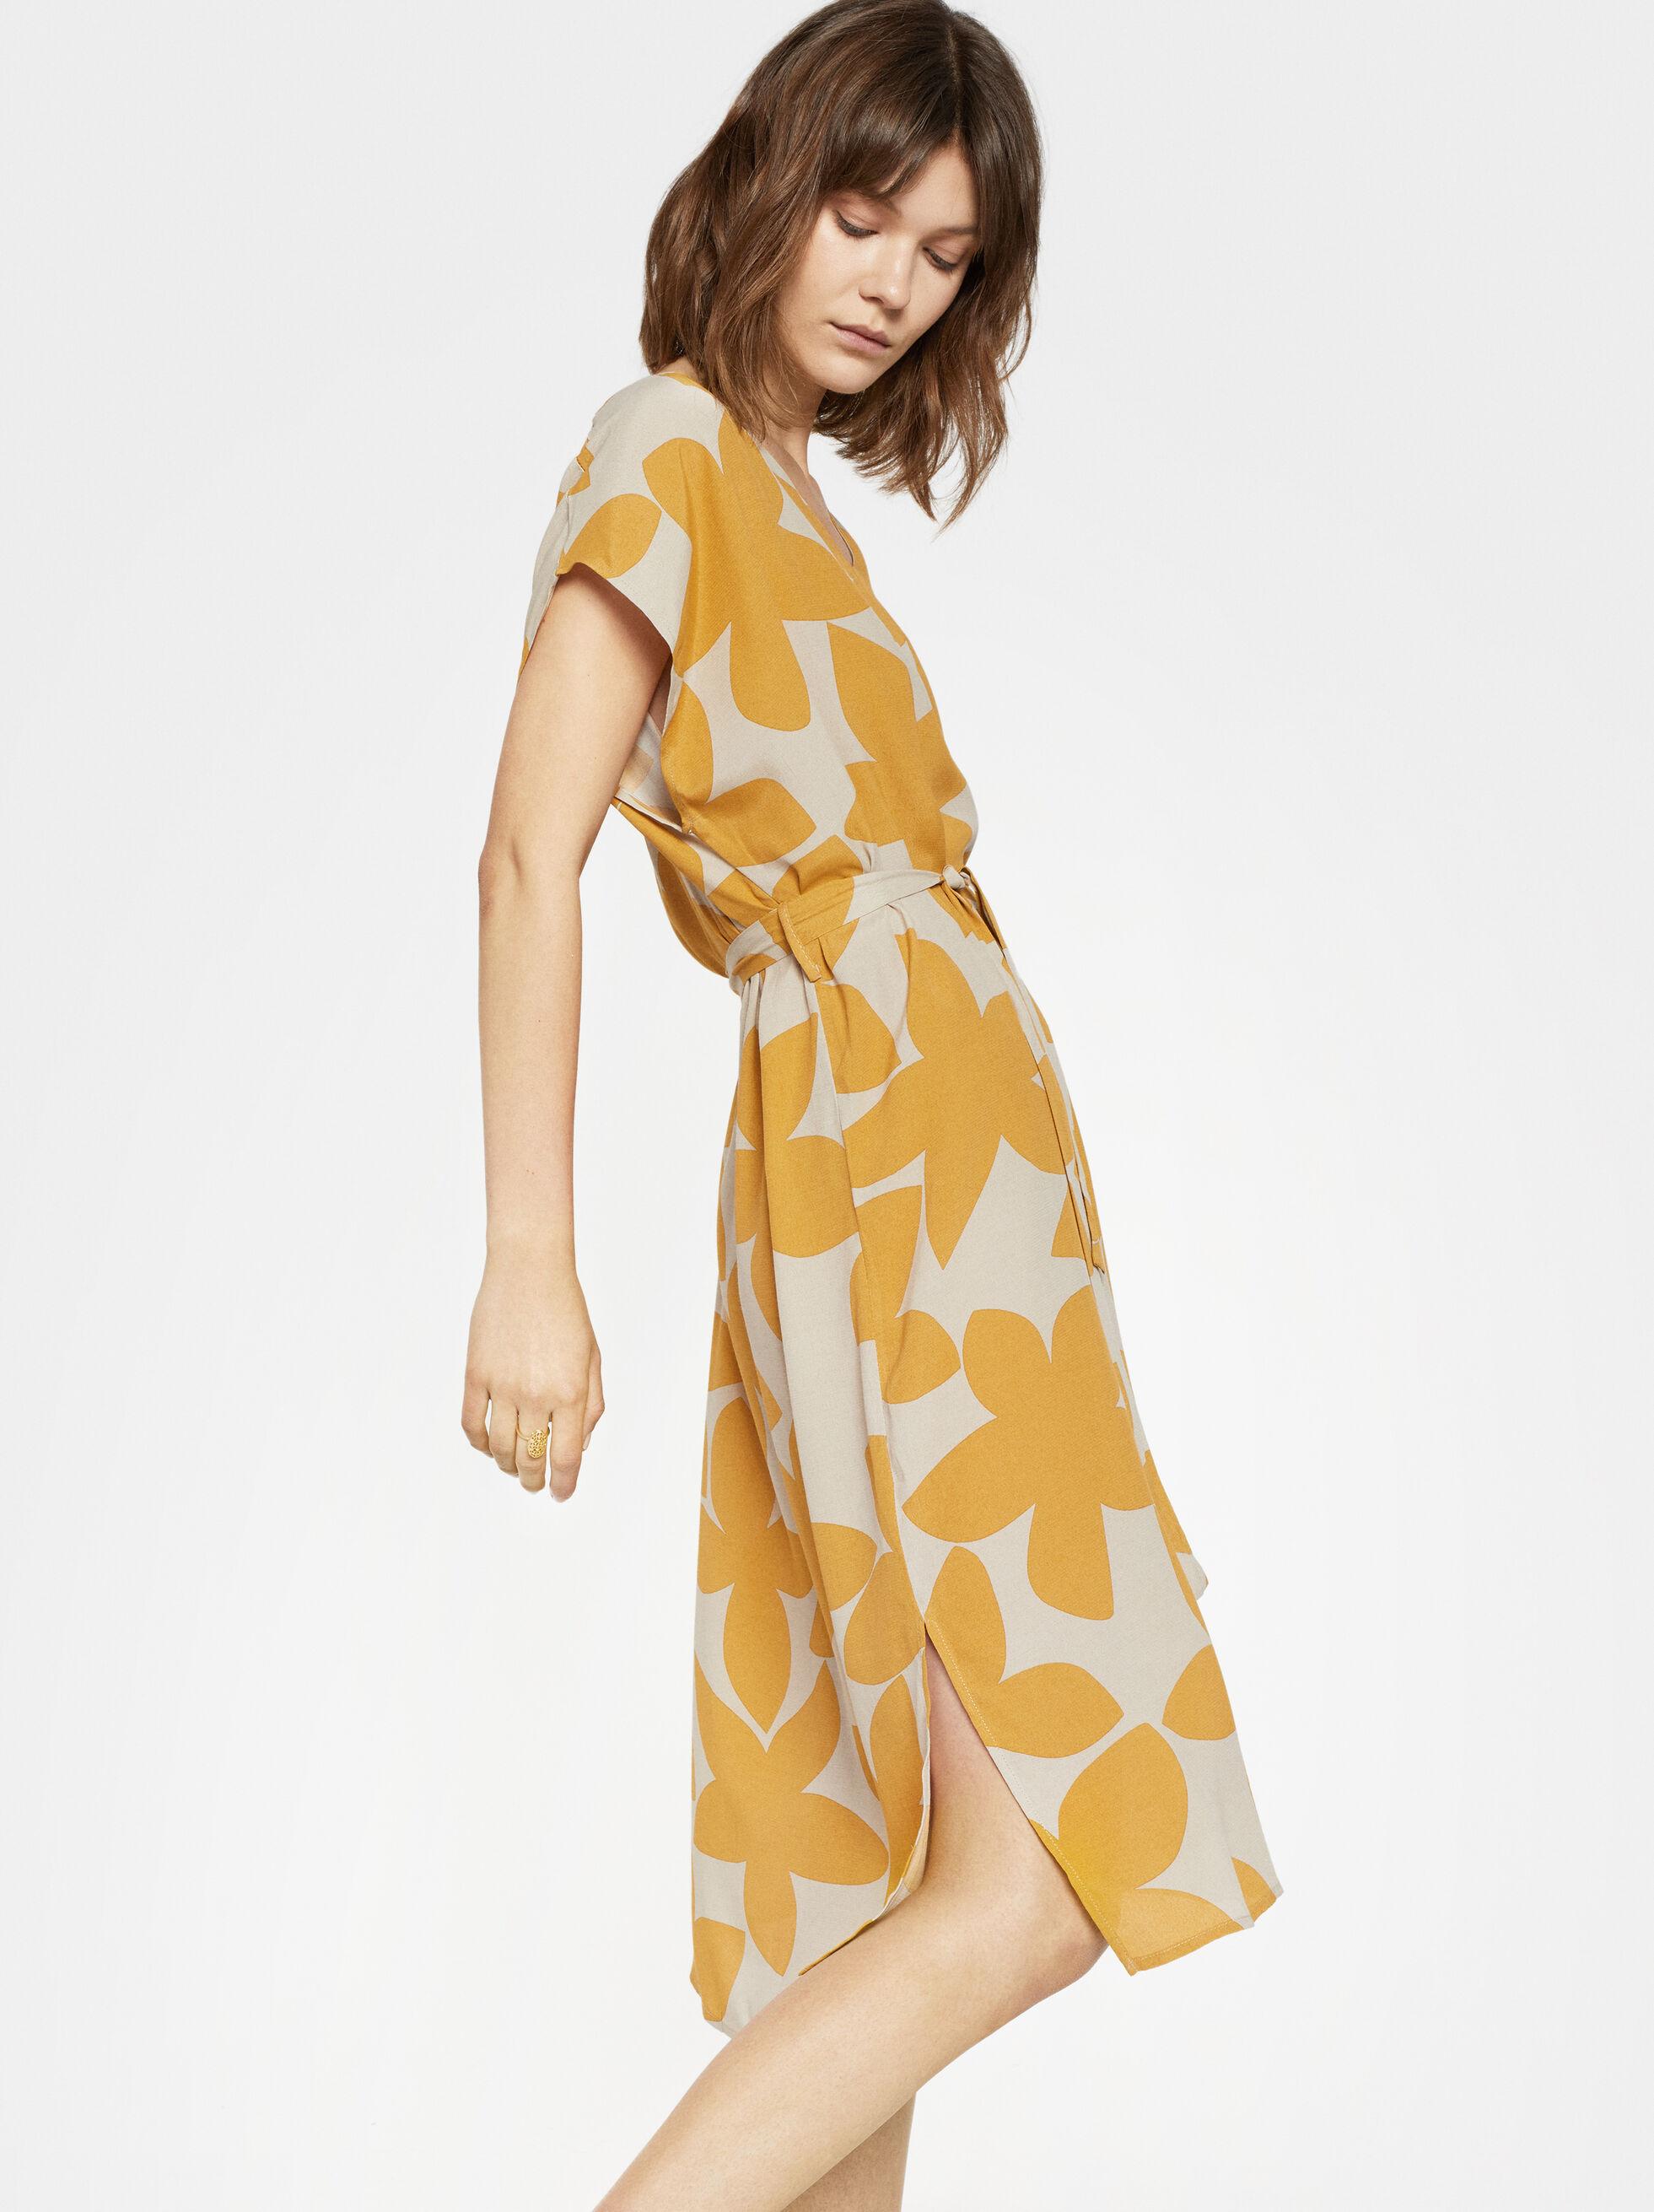 Floral Print Dress Online Exclusive, Mustard, hi-res